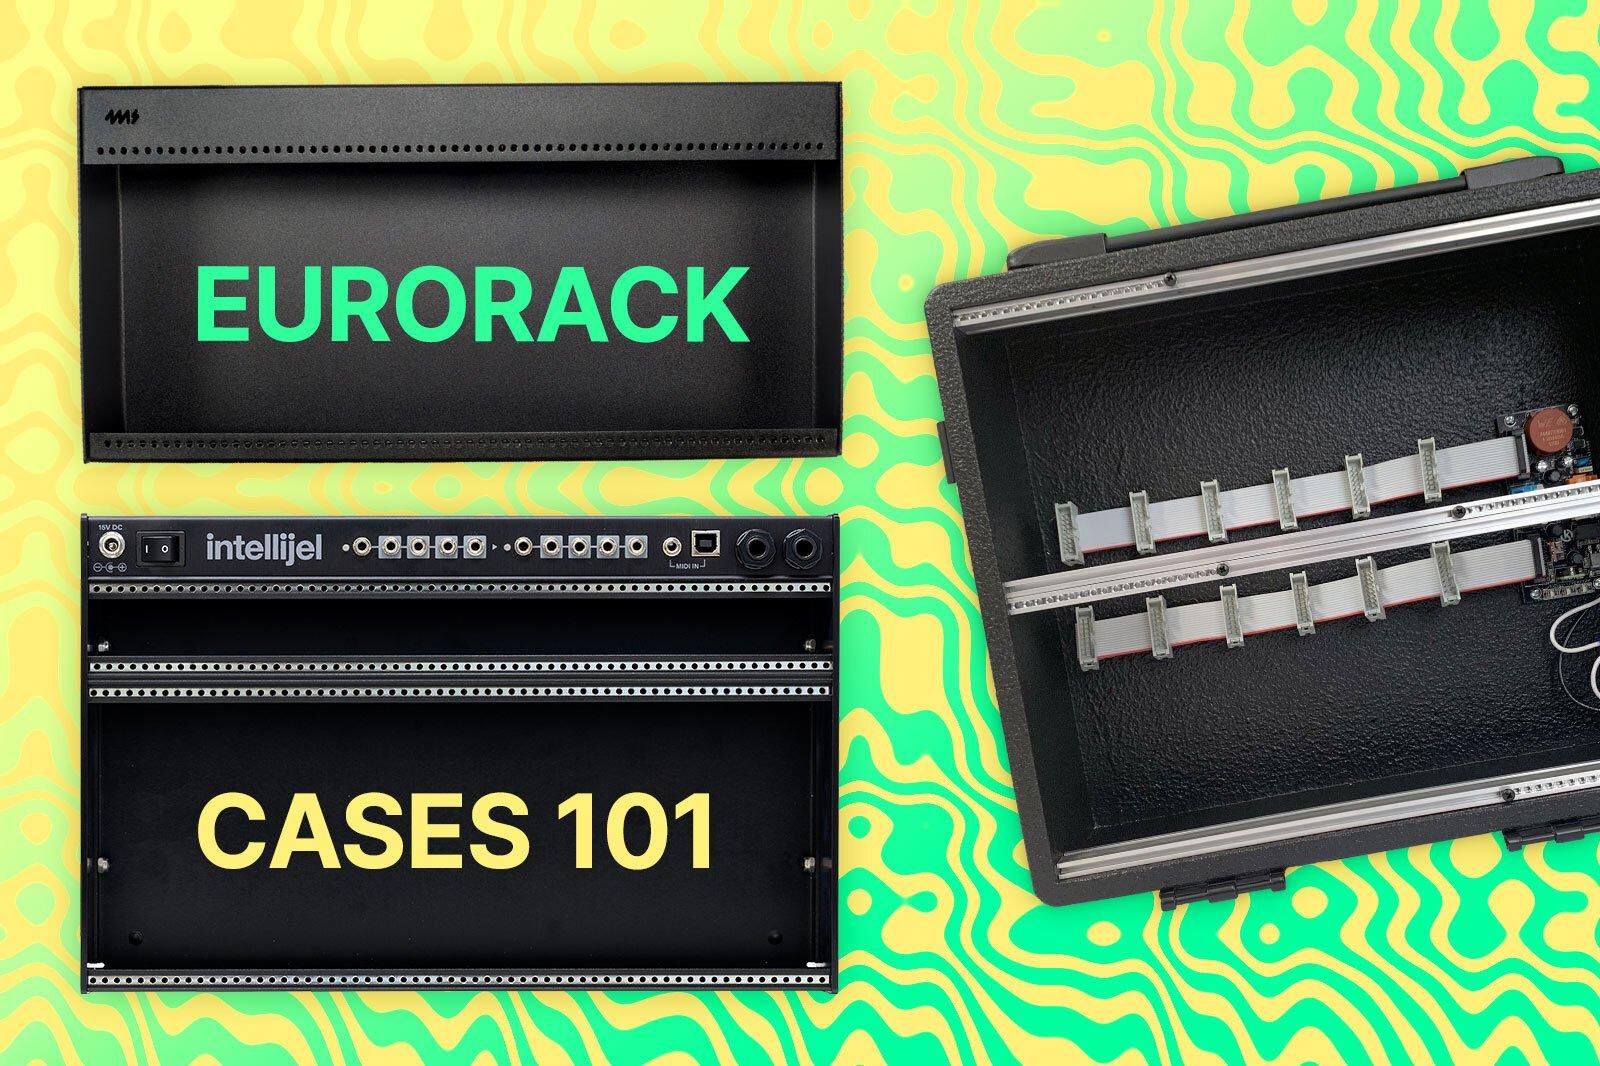 Eurorack Modular Case Basics